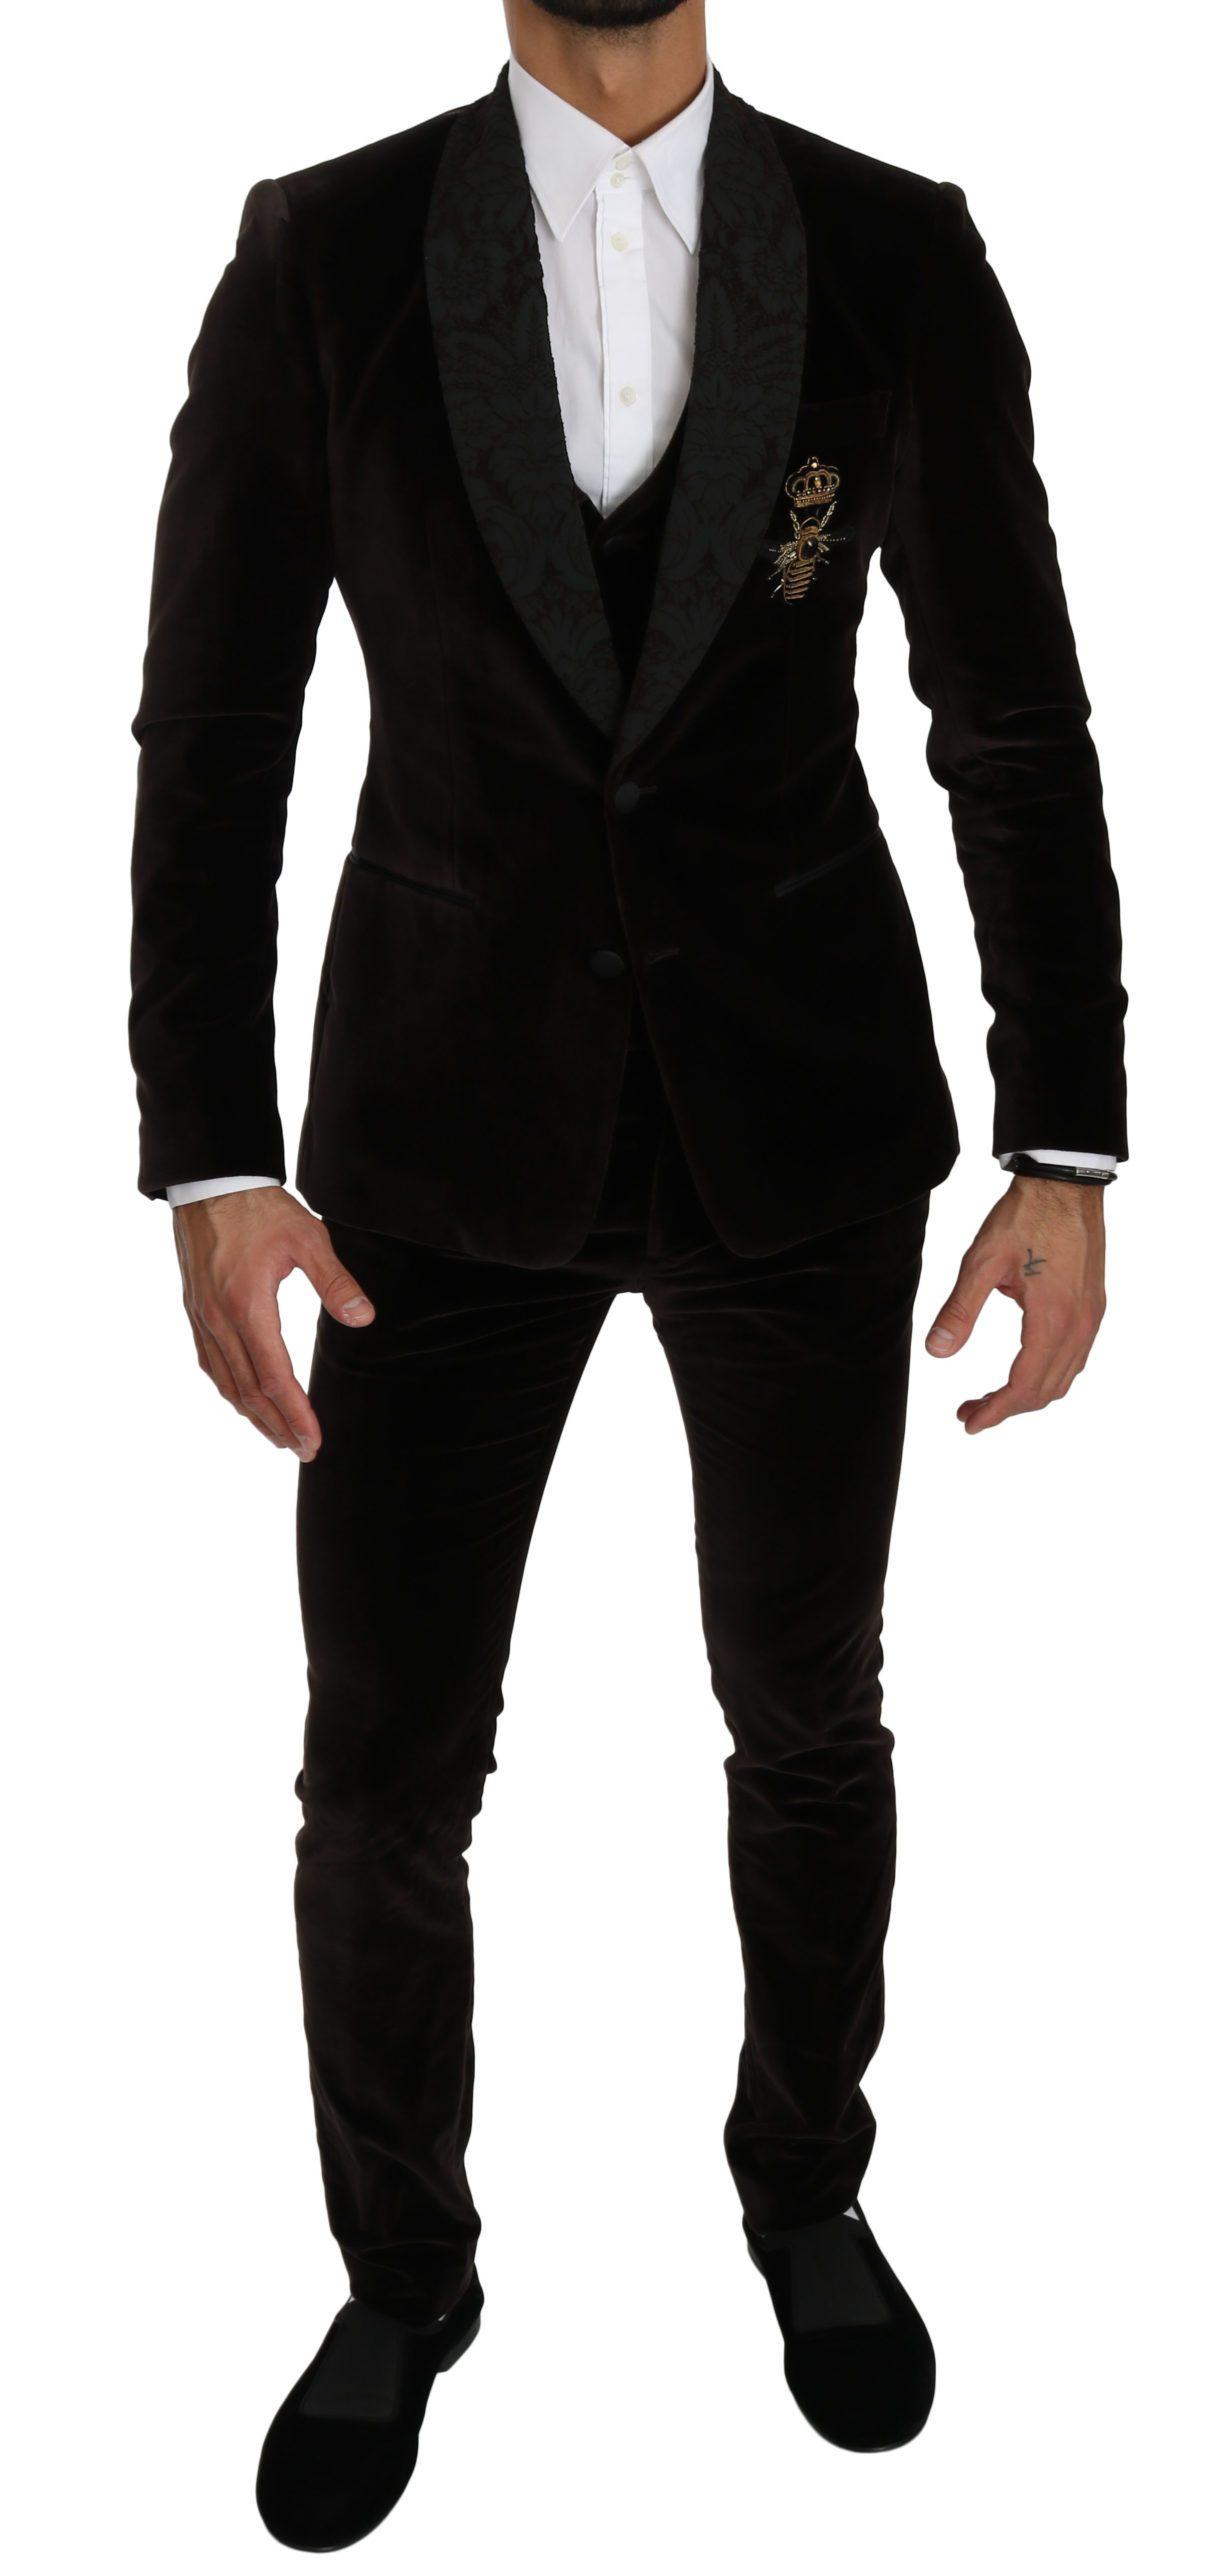 Dolce & Gabbana Men's Slim Fit Crown Bee 3 Piece Cotton Suit Brown KOS1544 - IT44 | XS